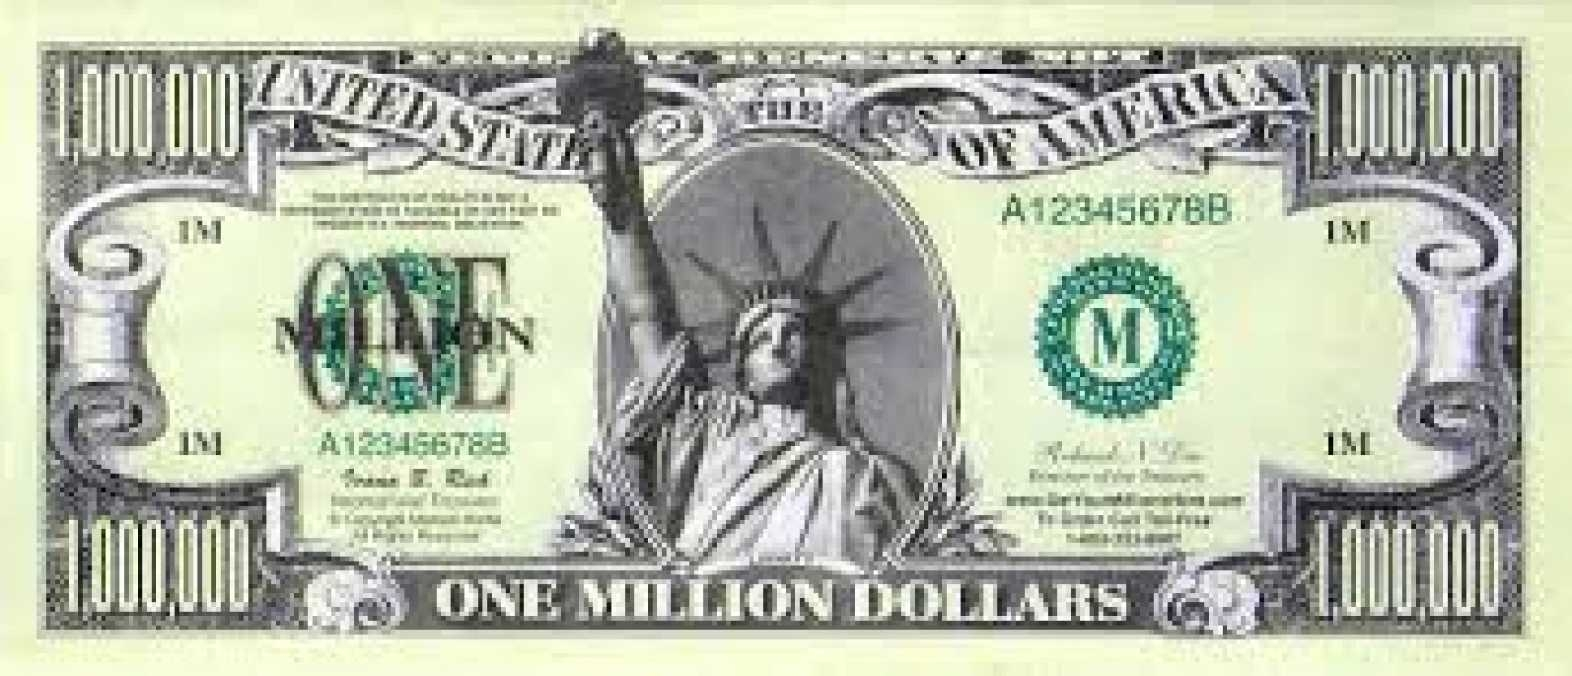 Cash clipart dollar bill. Hobieanthony sheet